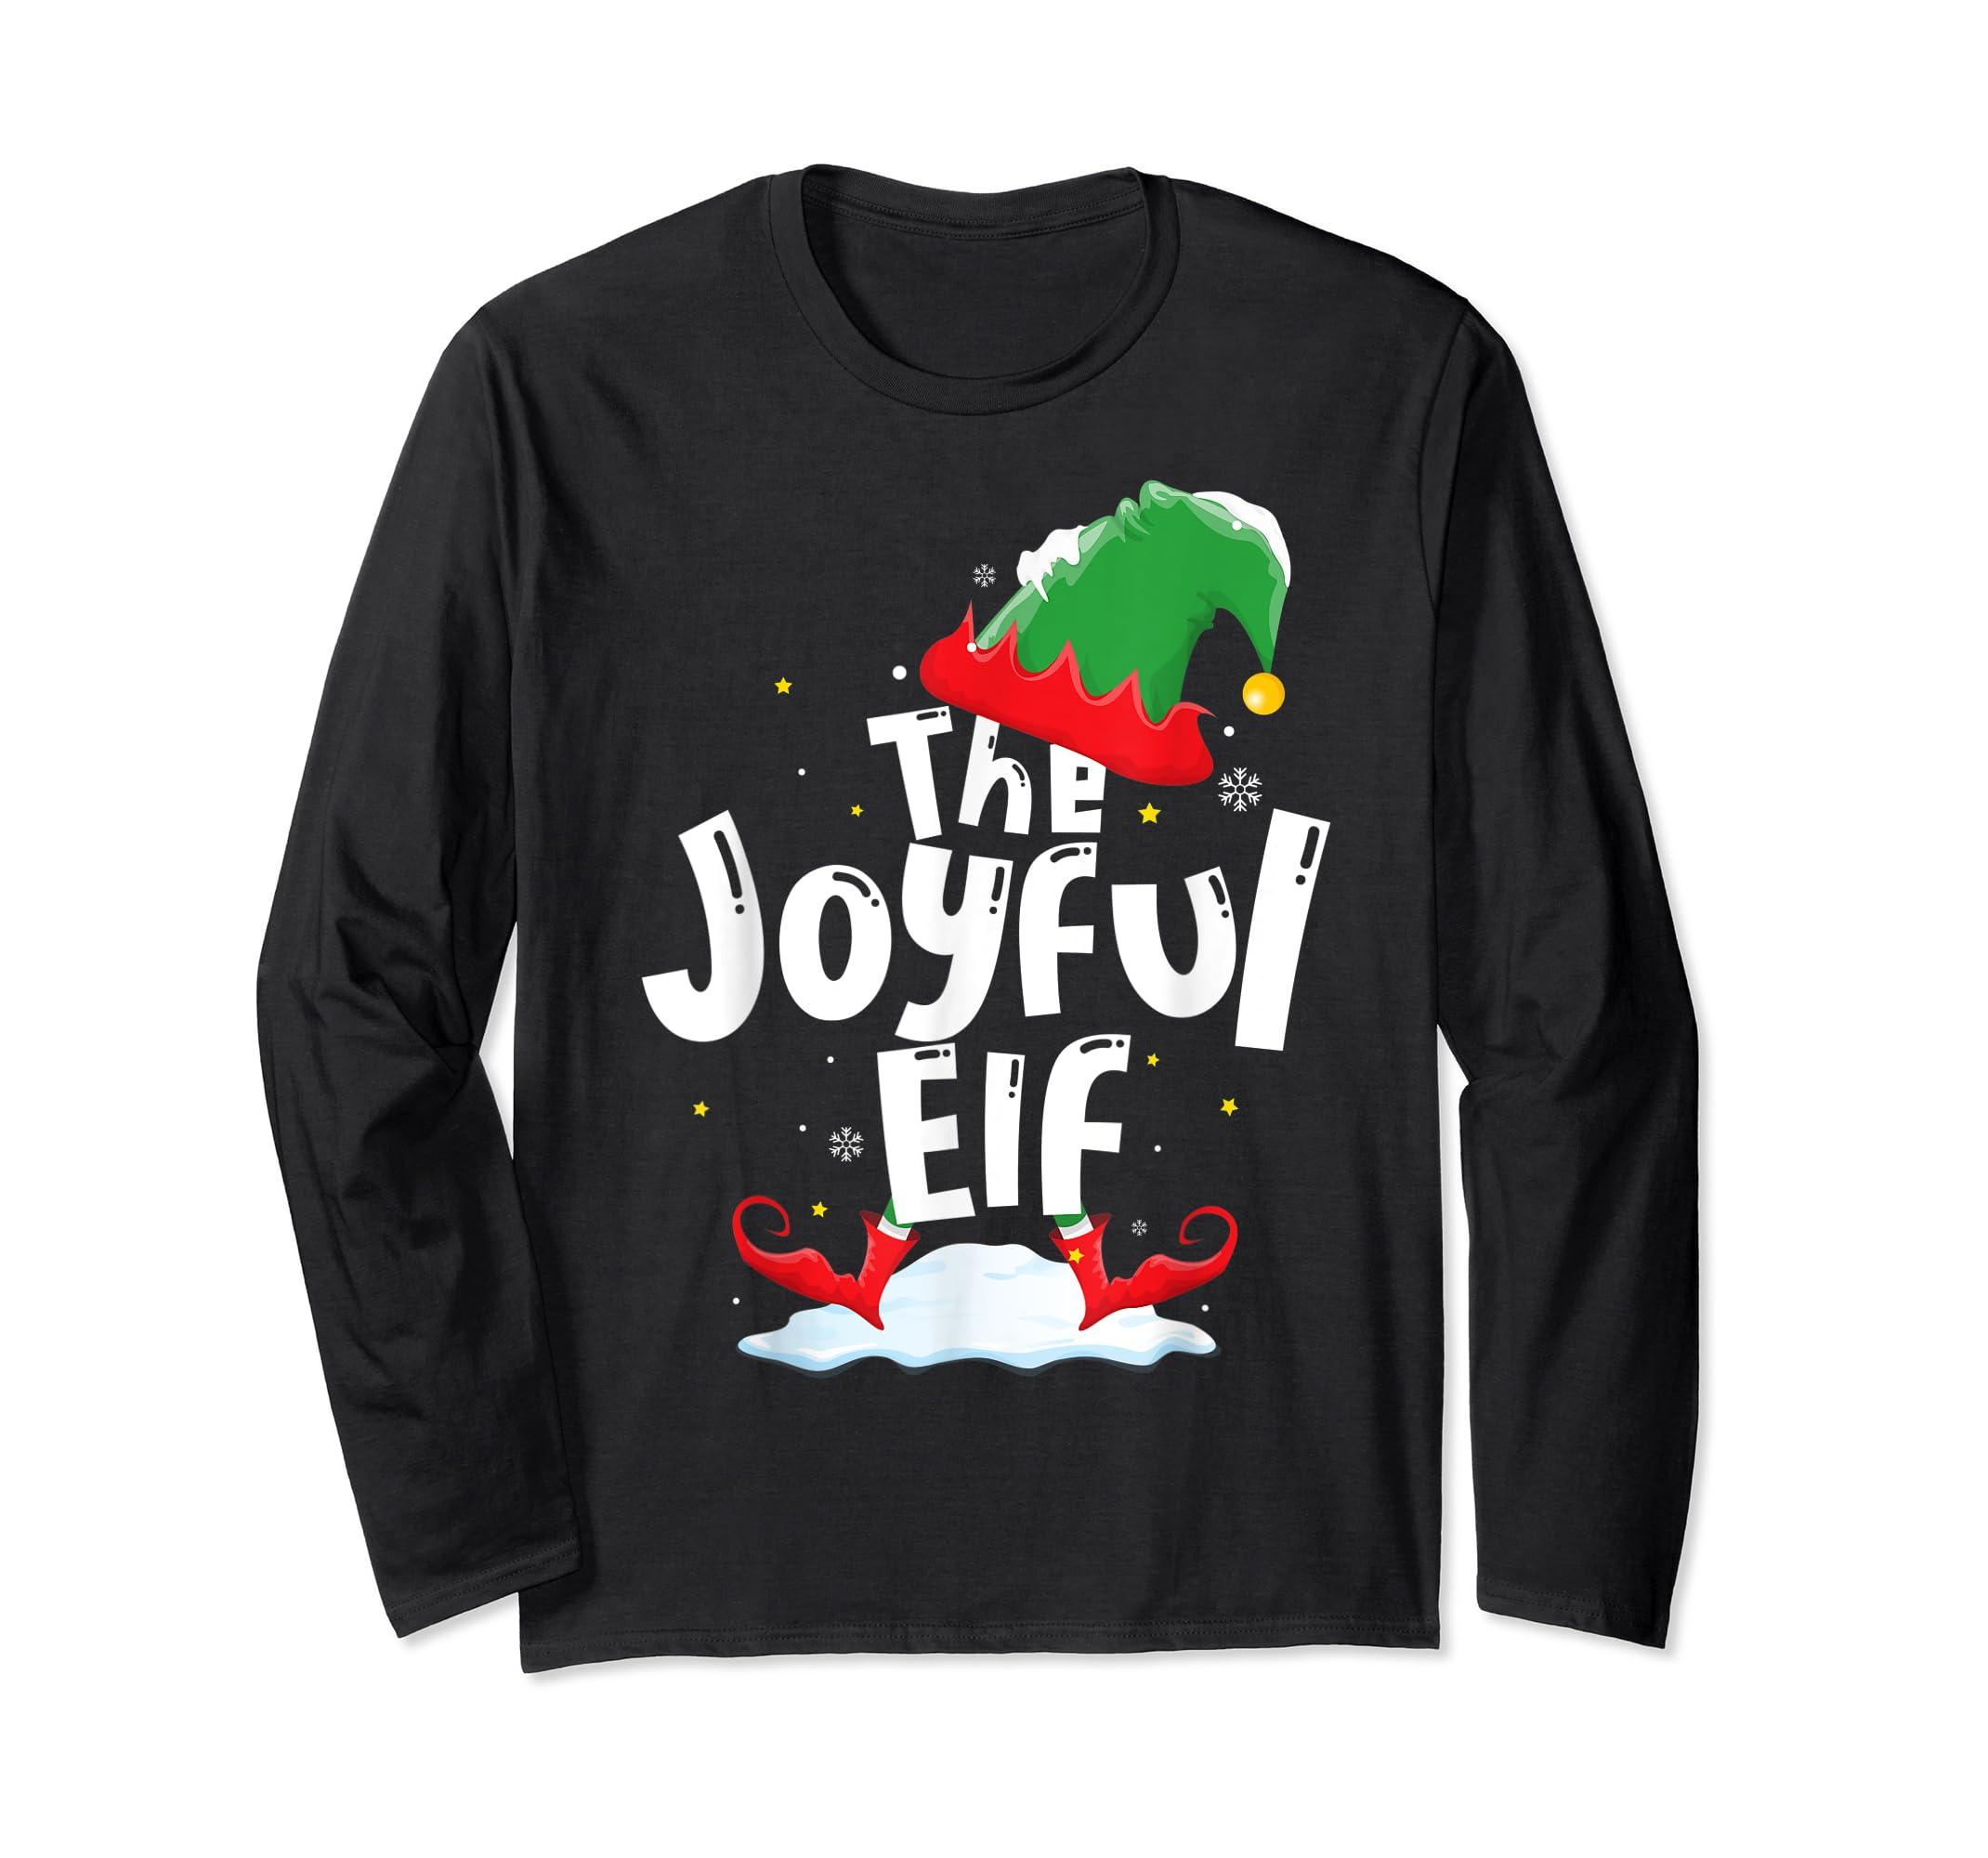 The Joyful Elf Group Matching Family Christmas Gifts Holiday T-Shirt-Long Sleeve-Black